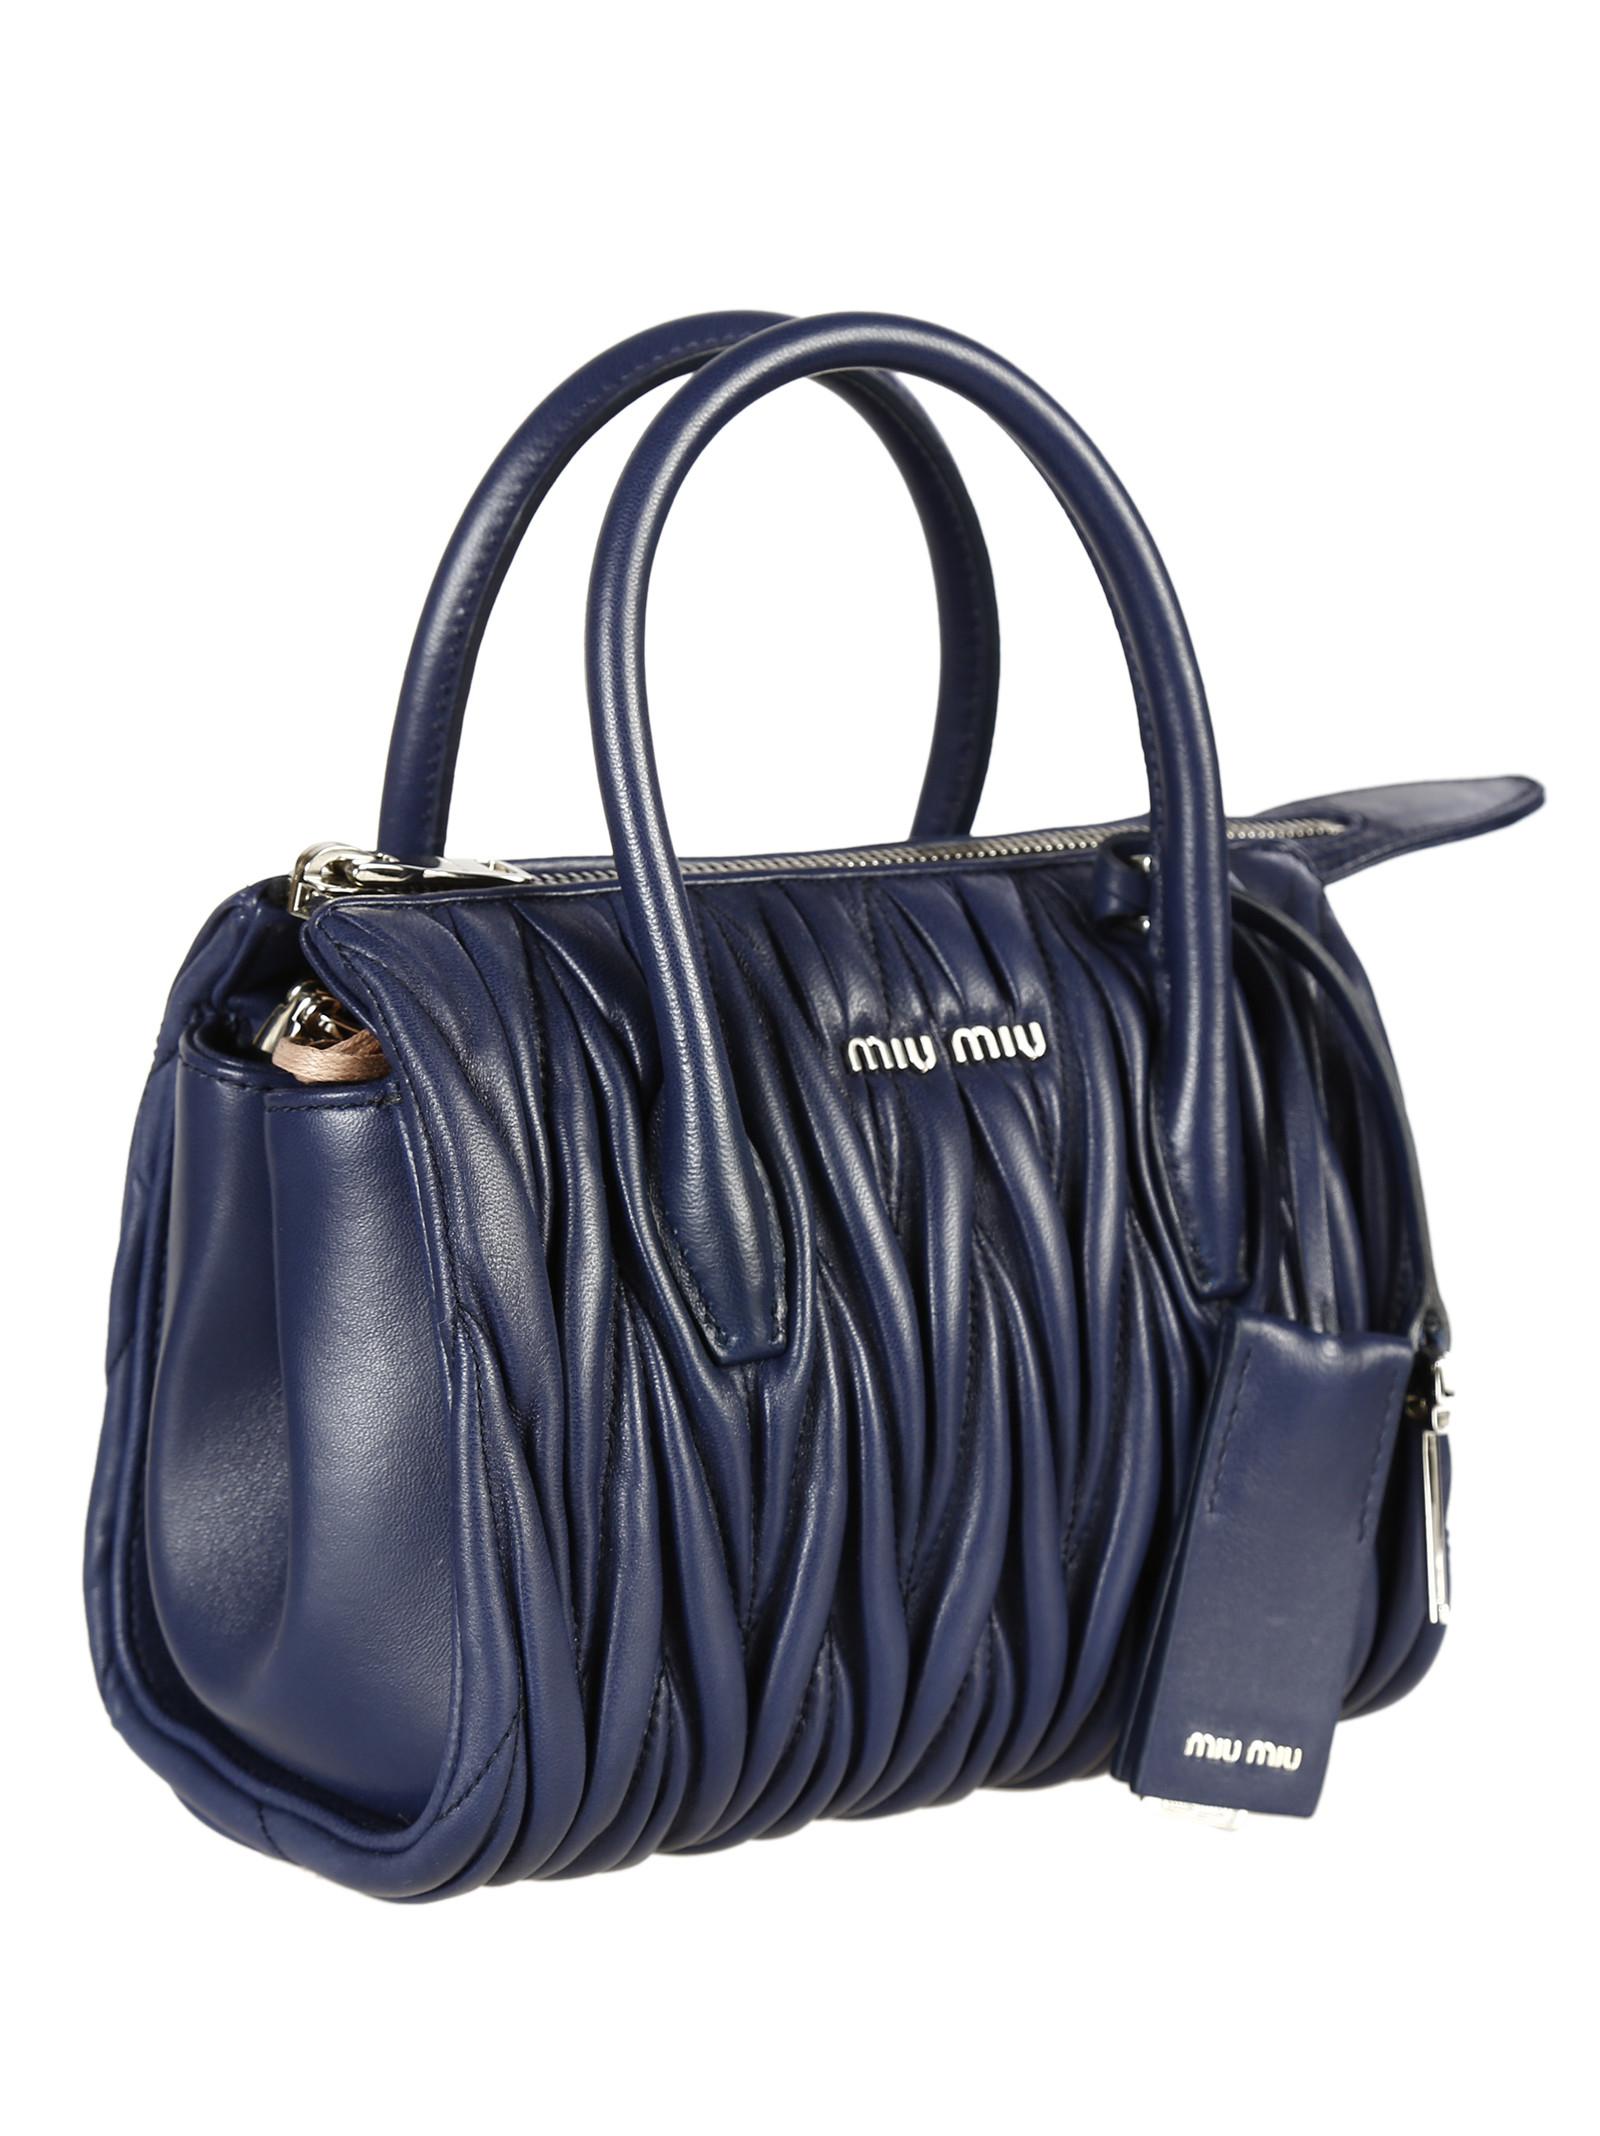 miu miu matelasse leather top handle bag in blue oltremare lyst. Black Bedroom Furniture Sets. Home Design Ideas